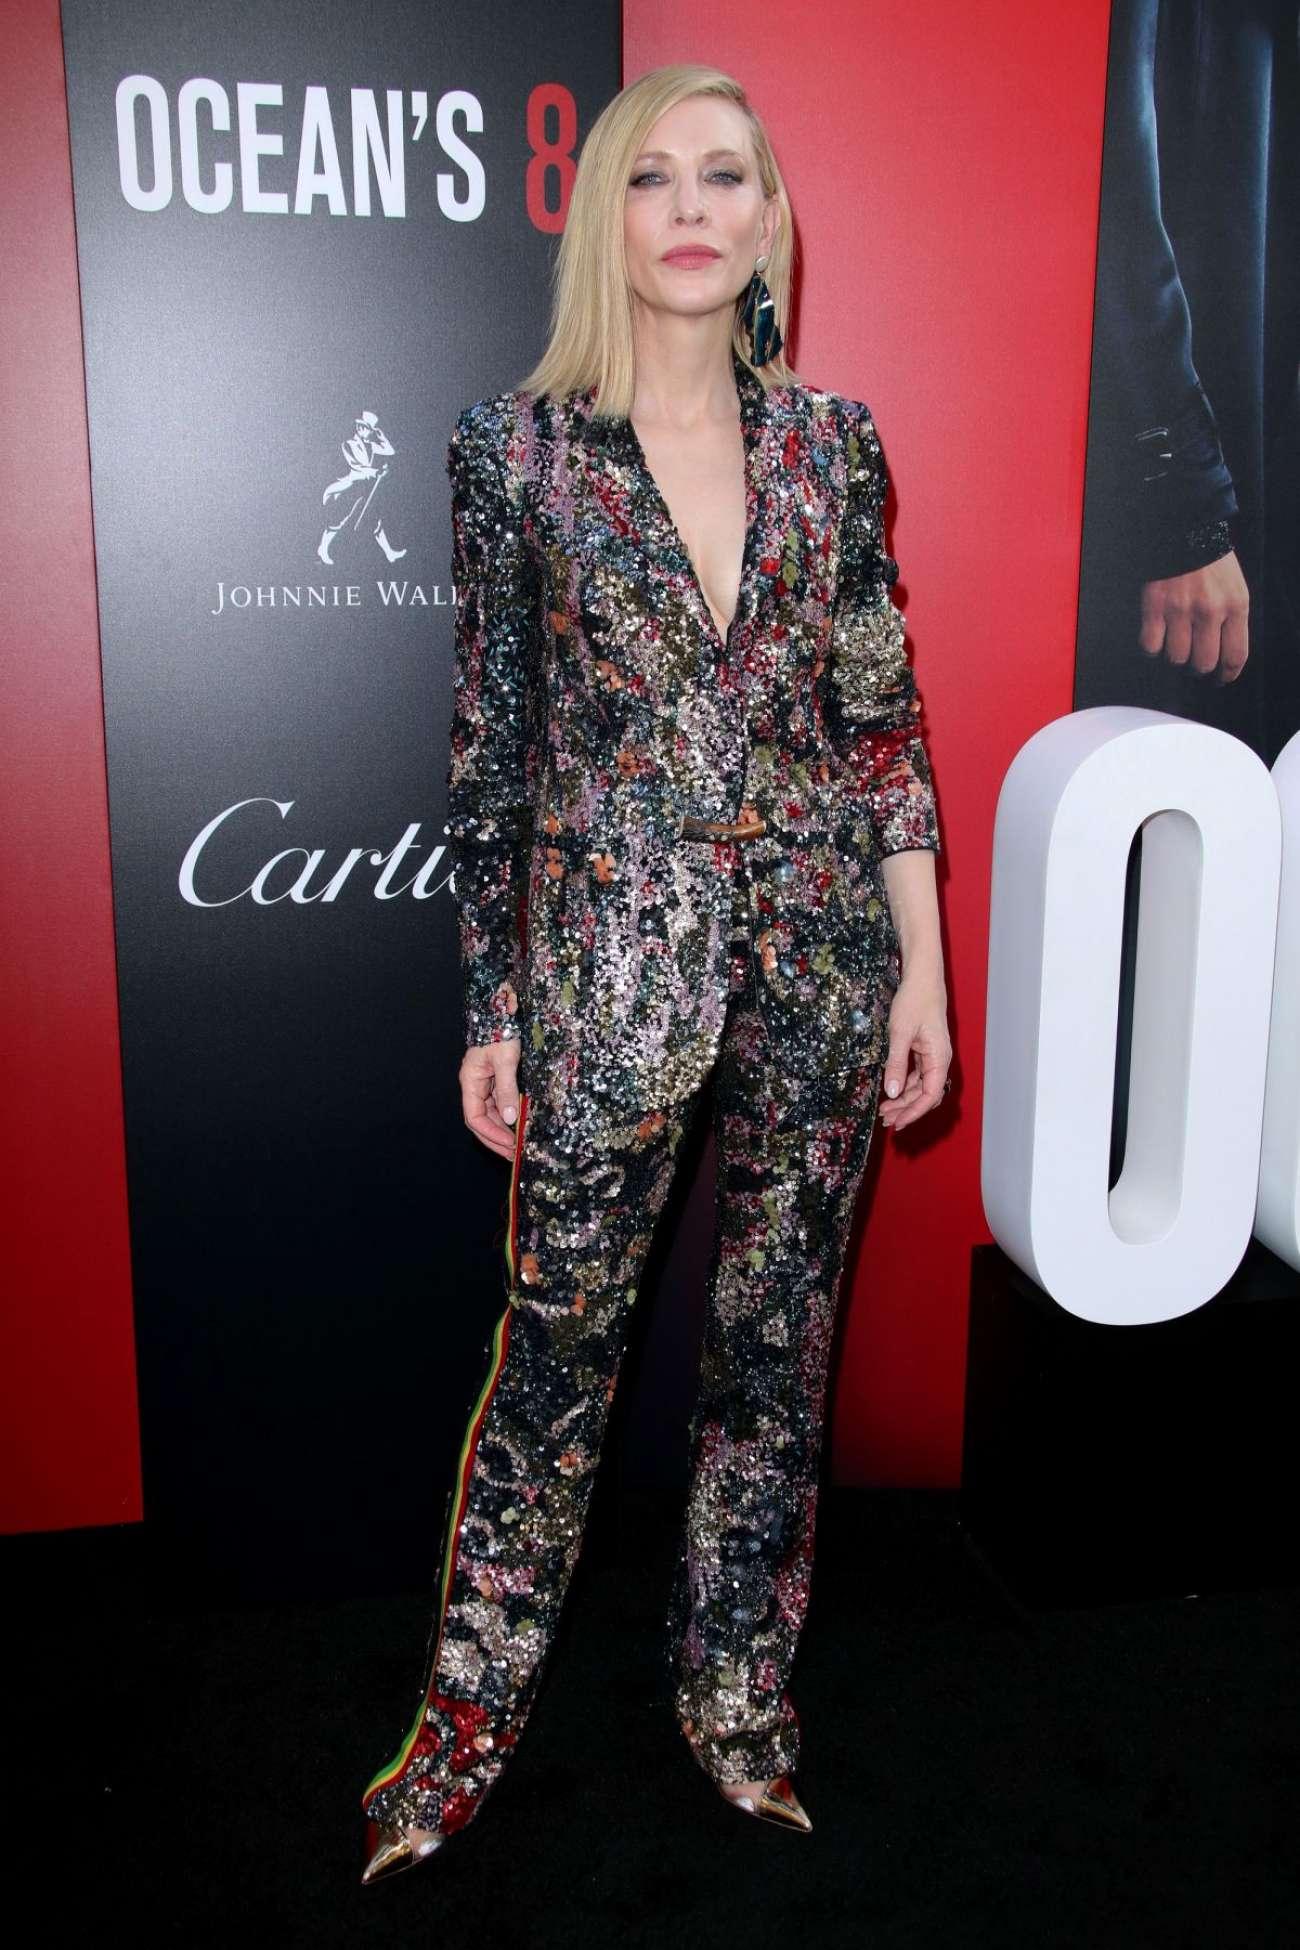 Cate Blanchett 2018 : Cate Blanchett: Ocean's 8 Premiere photocall In New York-03